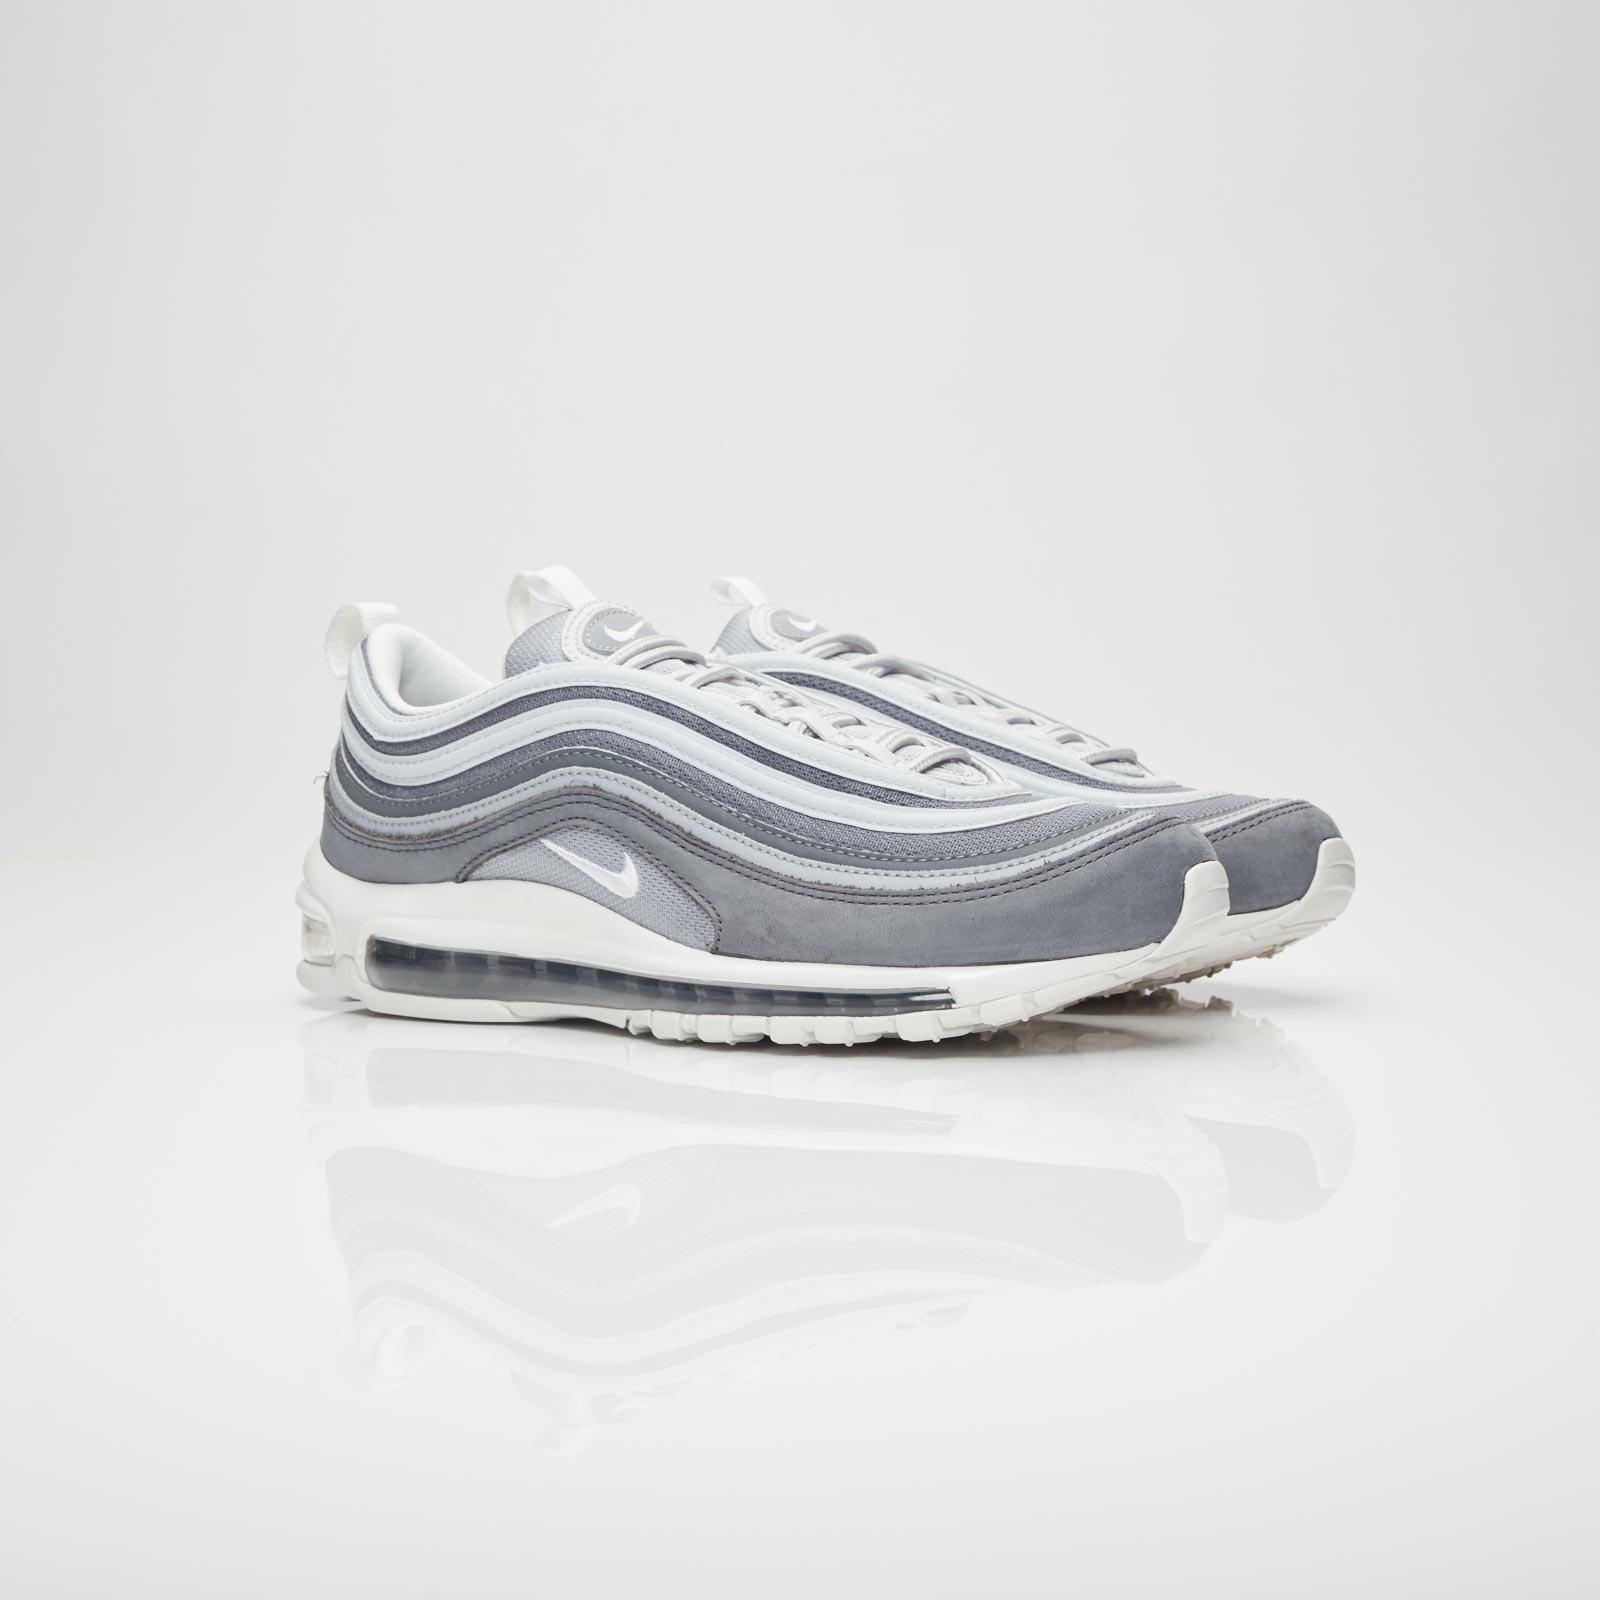 separation shoes f9470 4fe11 Nike Sportswear Air Max 97 Premium